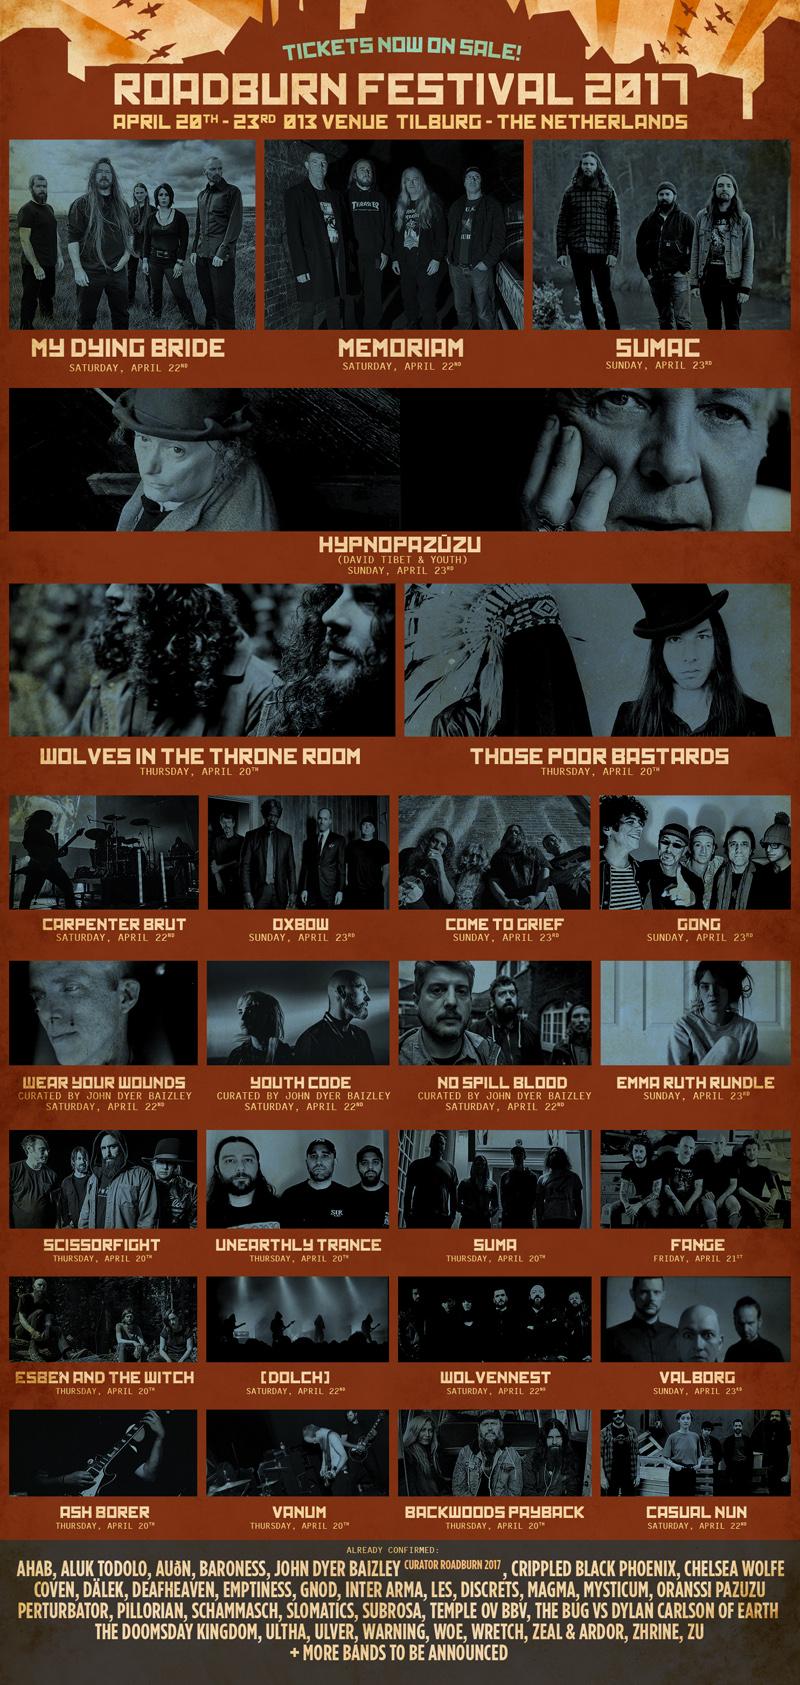 Twenty six new bands added to the Roadburn 2017 line up